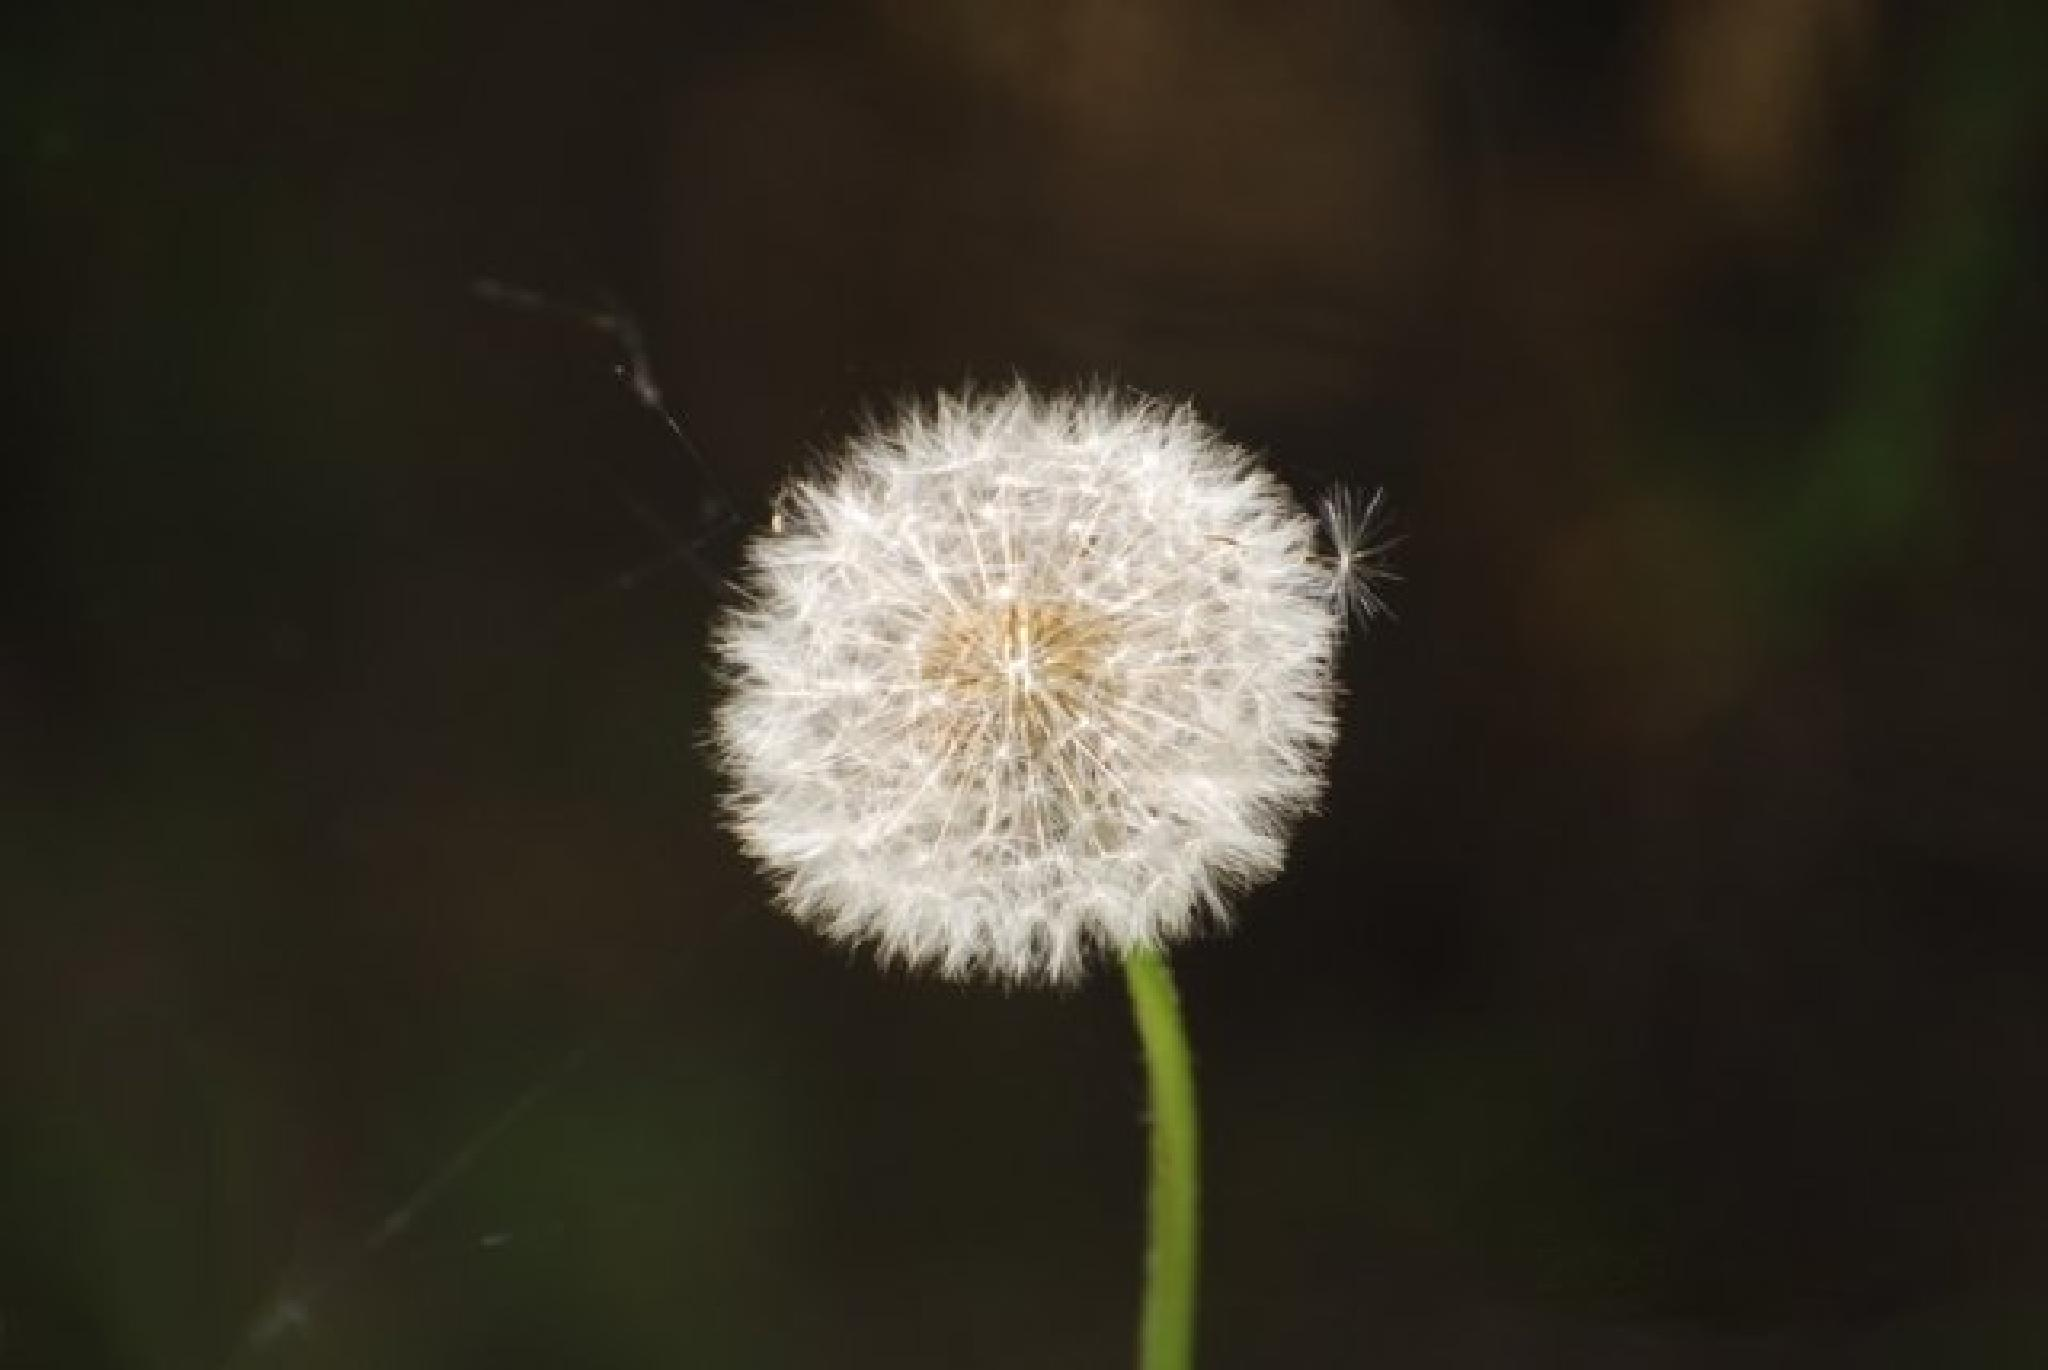 Dandelion by wudzman